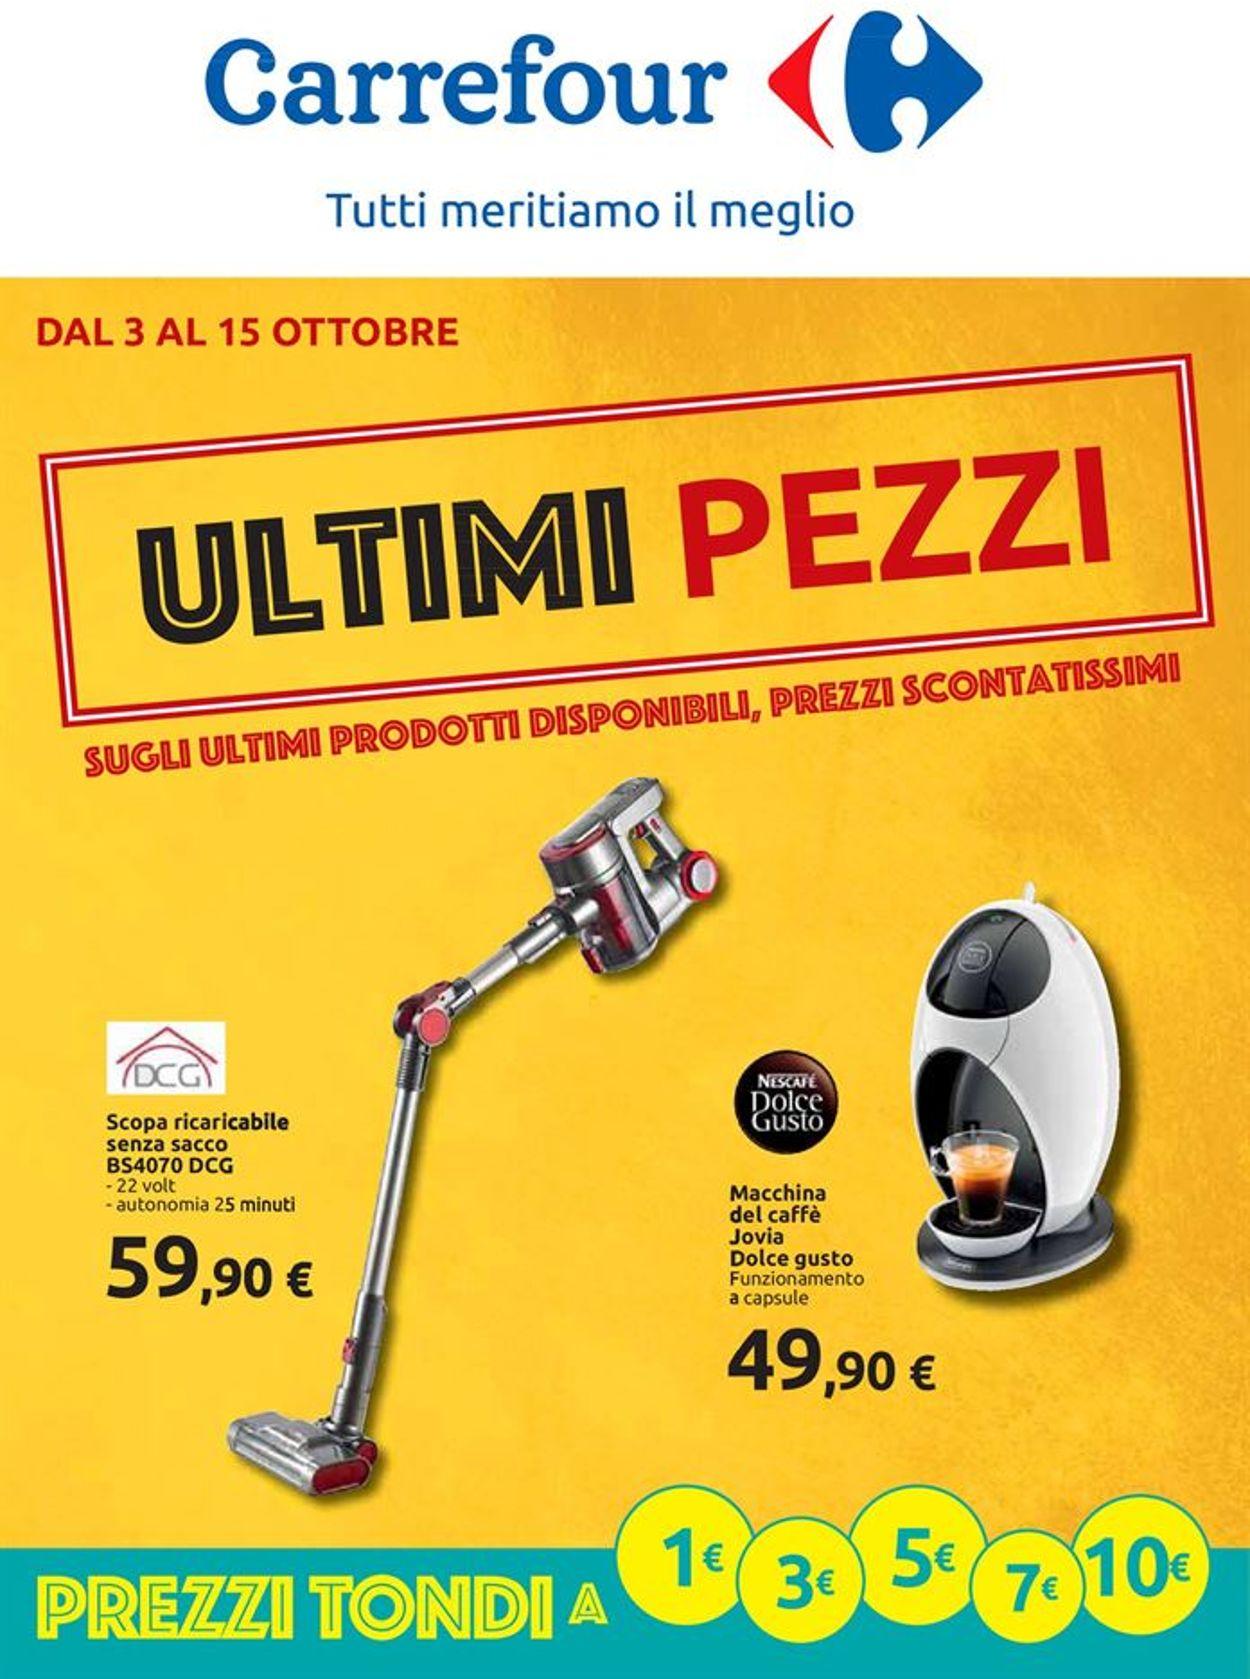 Volantino Carrefour - Offerte 03/10-15/10/2019